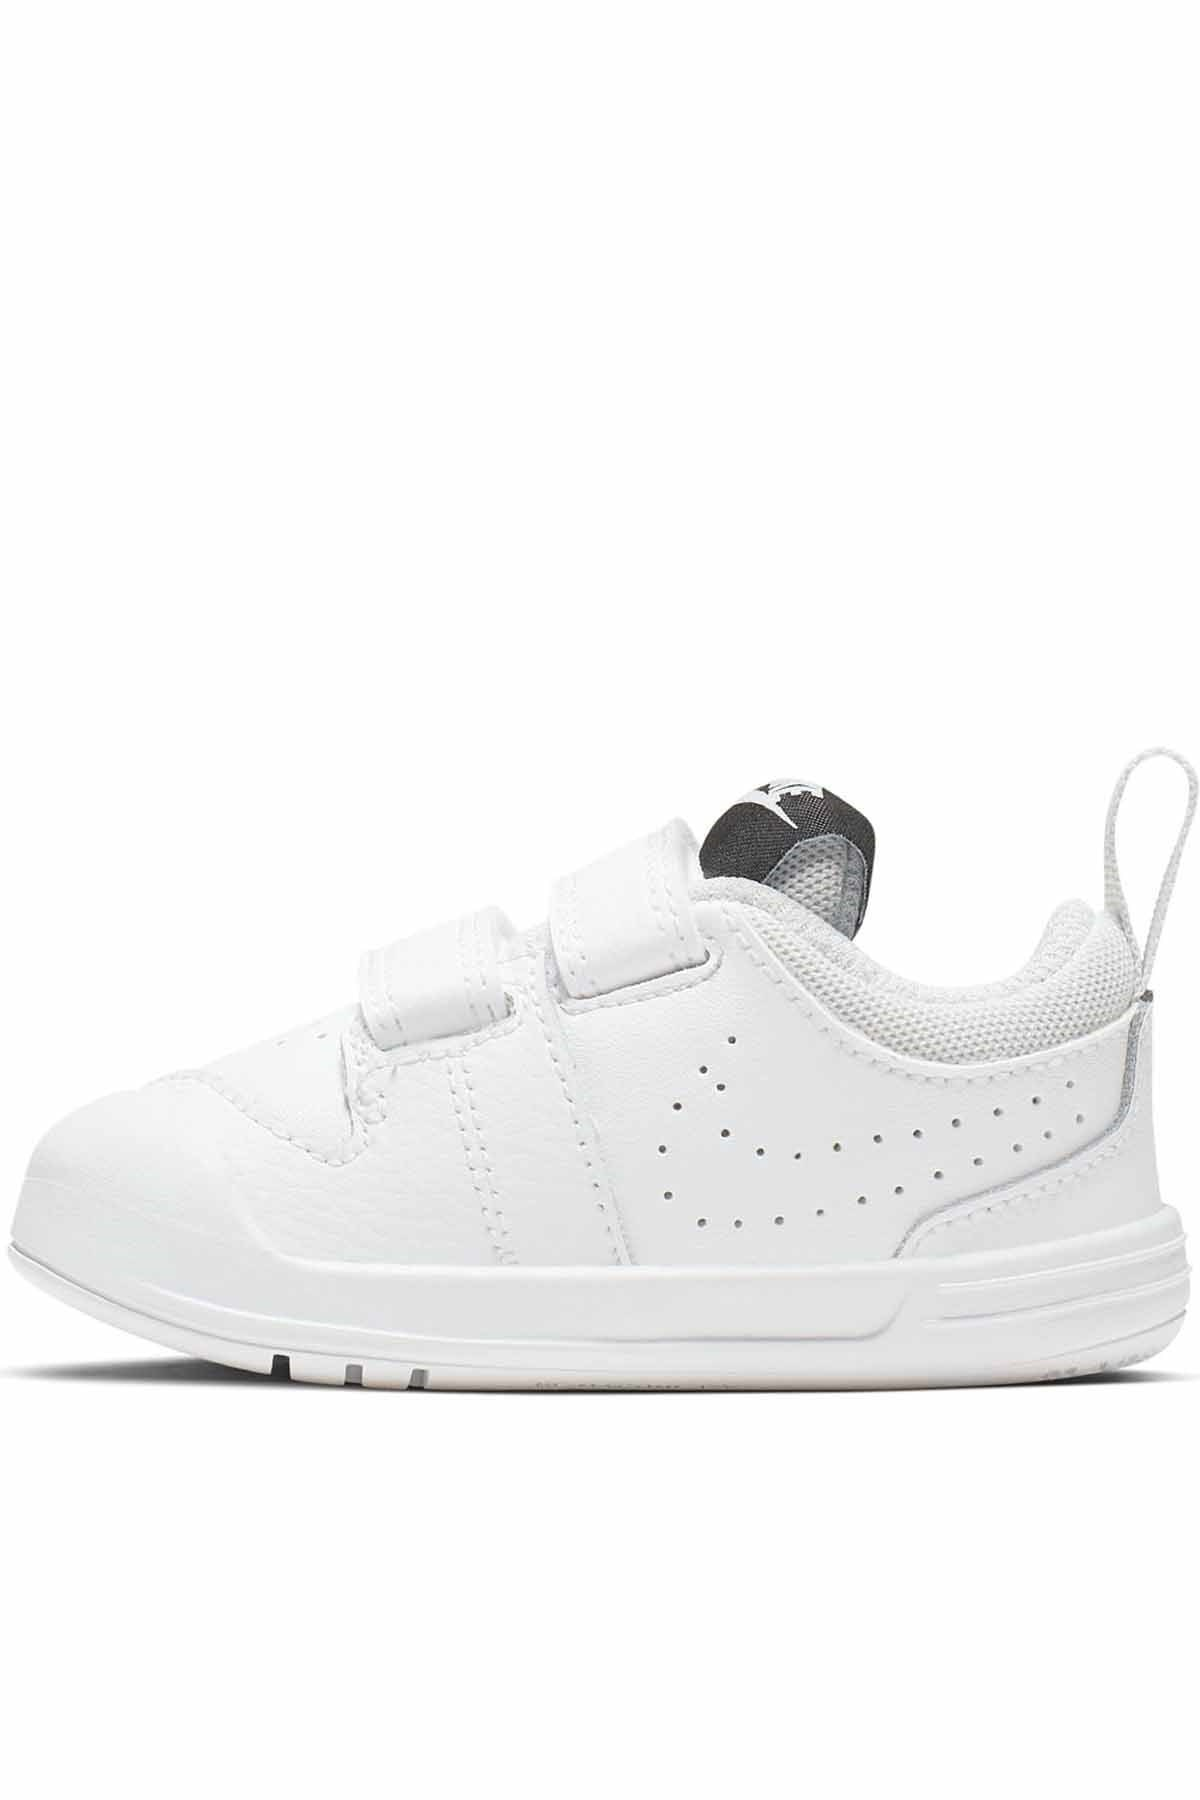 Nike Kids Pico 5 Çocuk Ayakkabısı 2